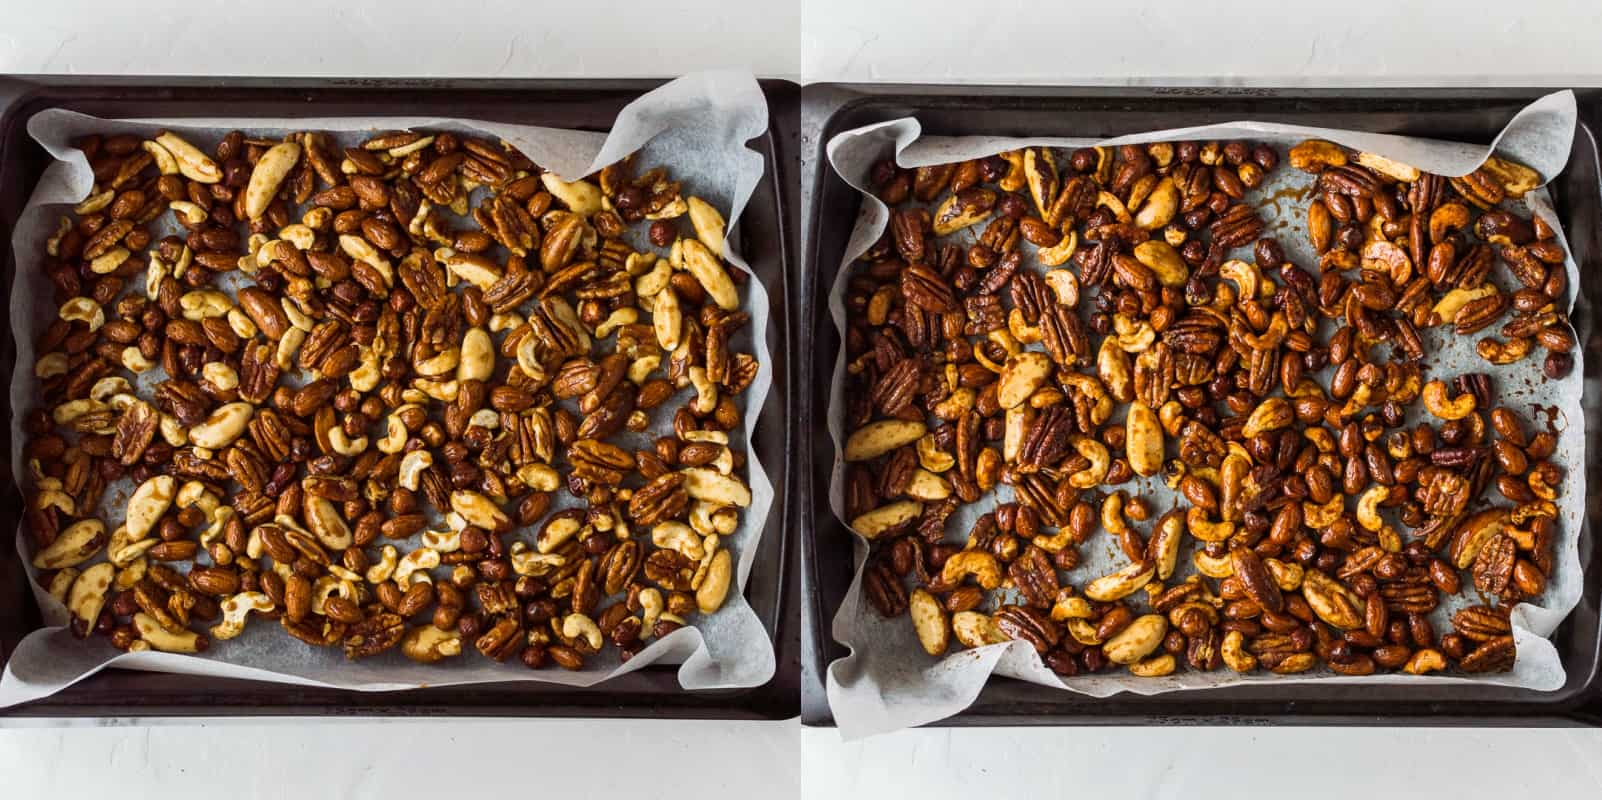 Spiced honey roasted nuts step 2